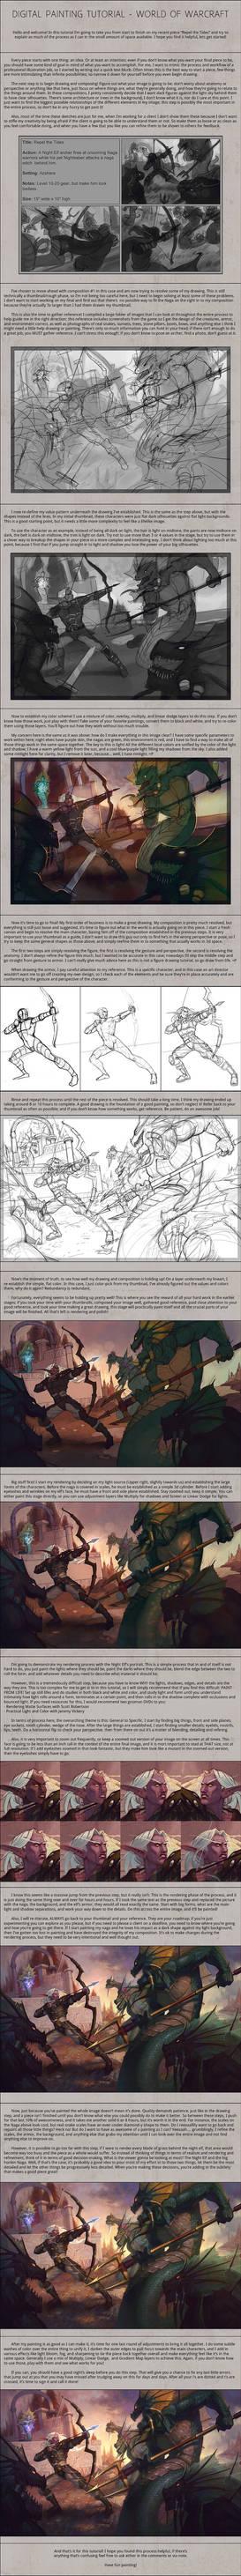 Digital Painting Tutorial - World of Warcraft